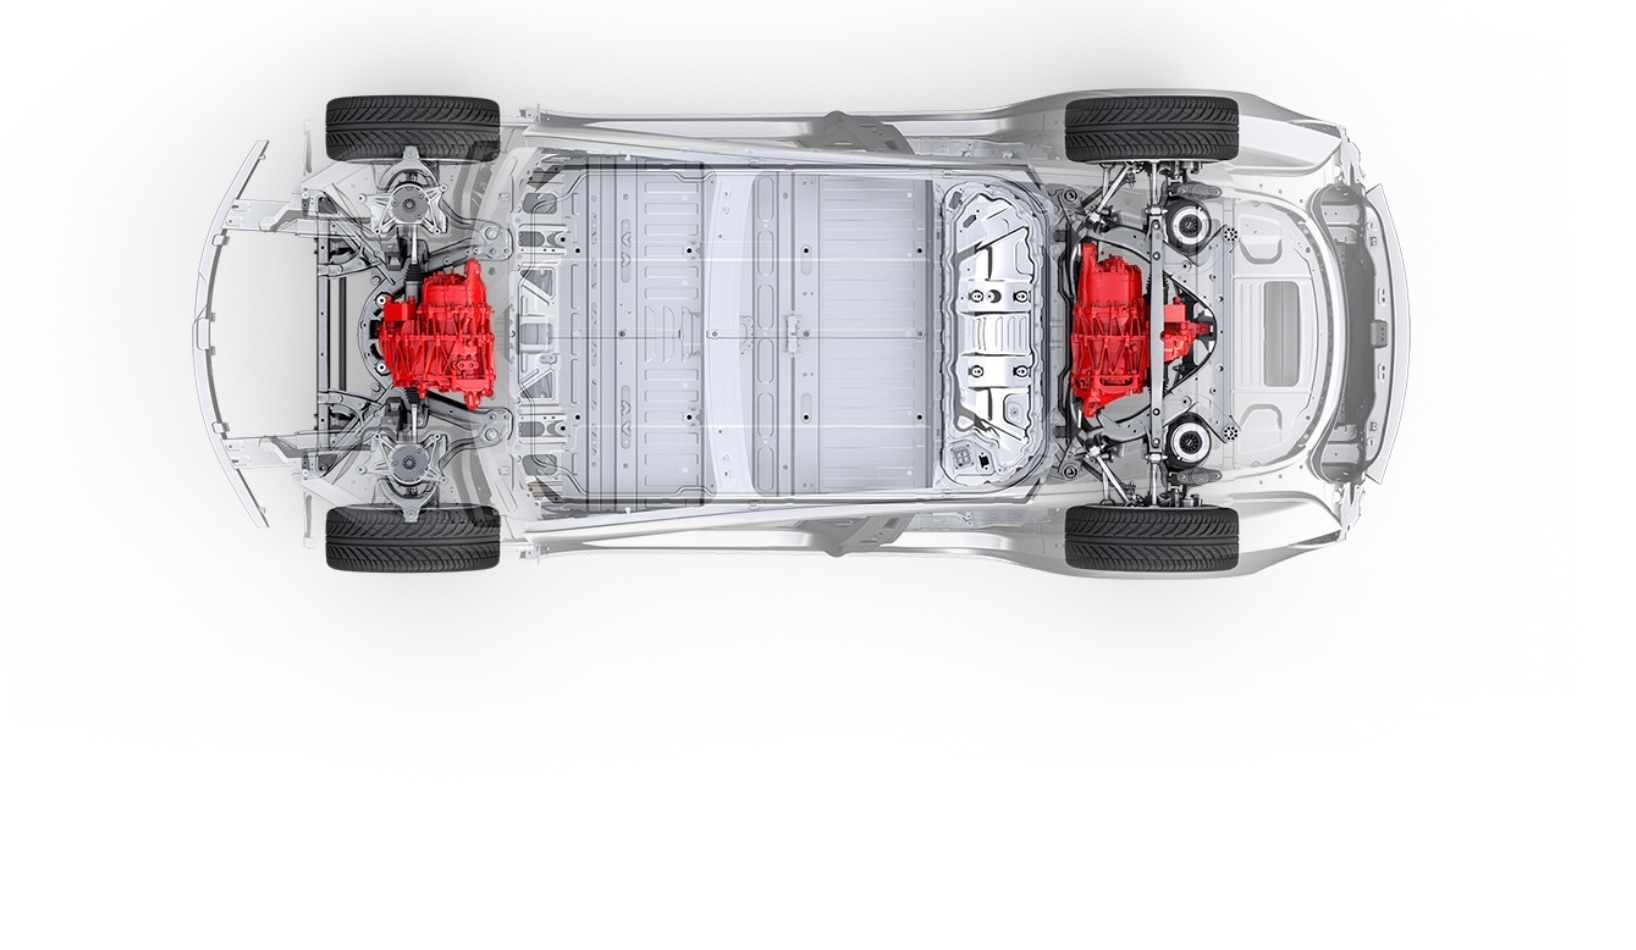 tesla model 3 with dual motor awd spotted in san francisco Tesla Gun